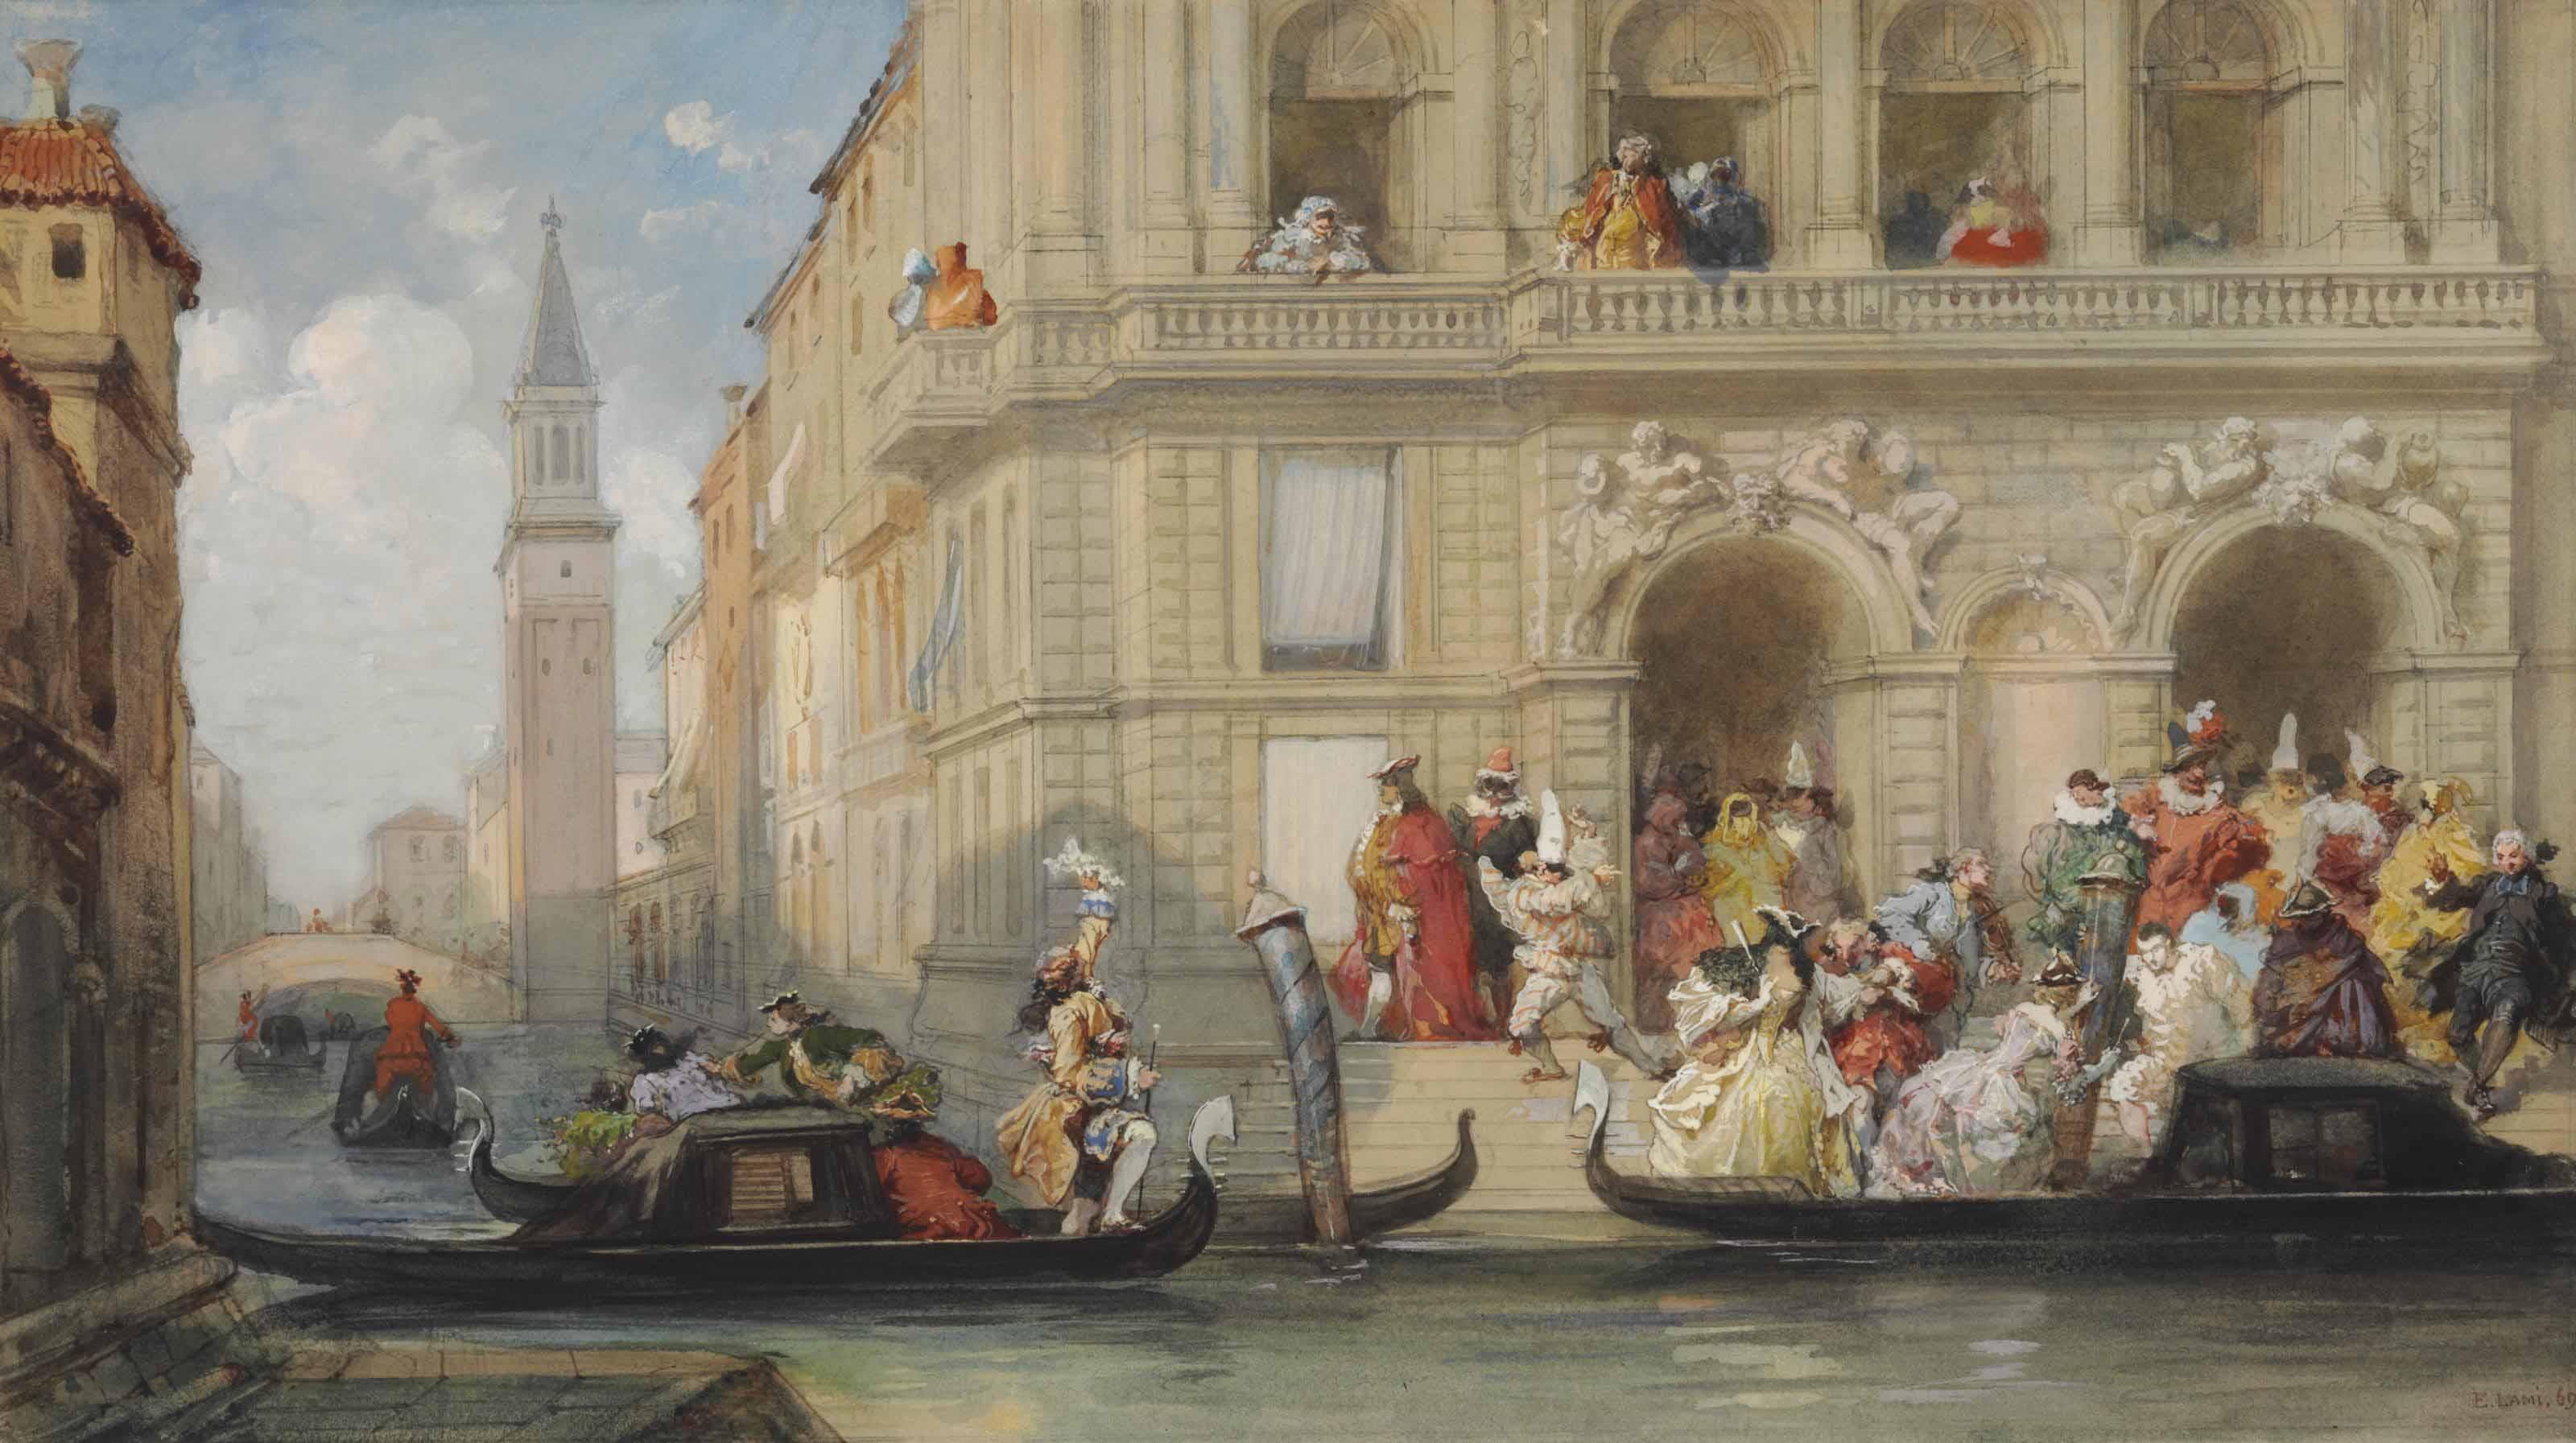 Masqueraders on gondolas in Venice